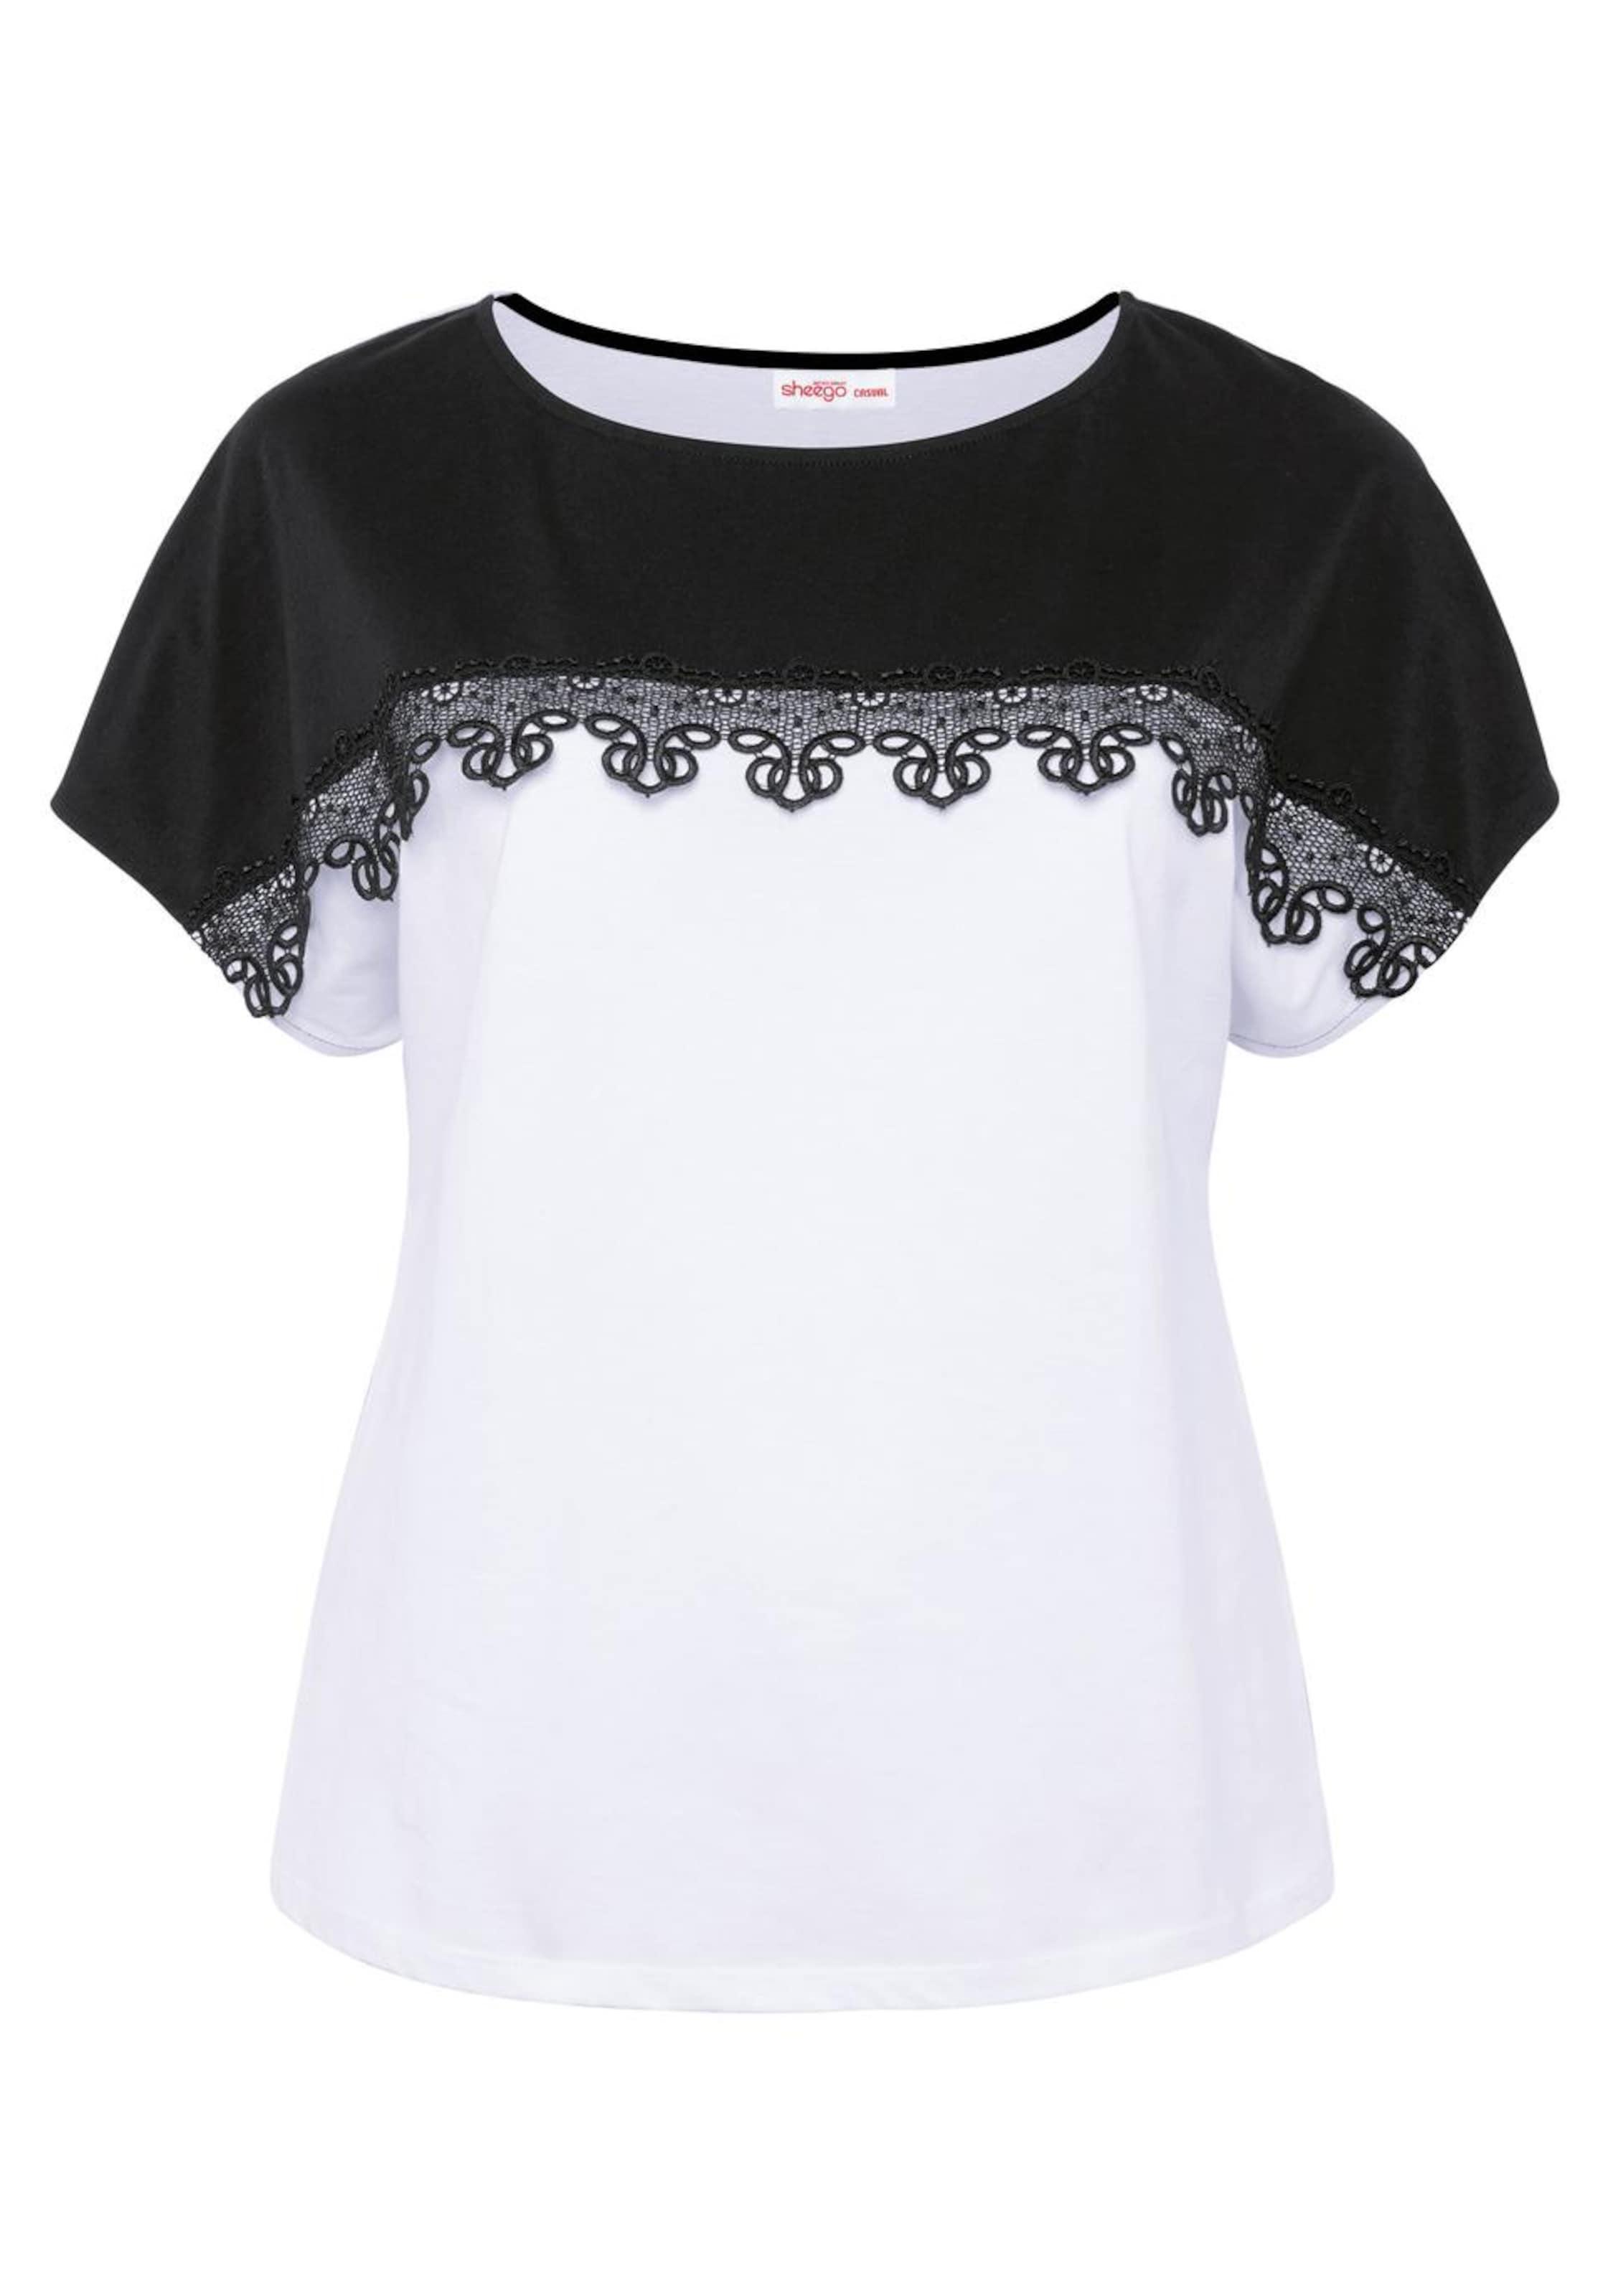 SchwarzWeiß Sheego T In T Sheego shirt KT1cFlJ3